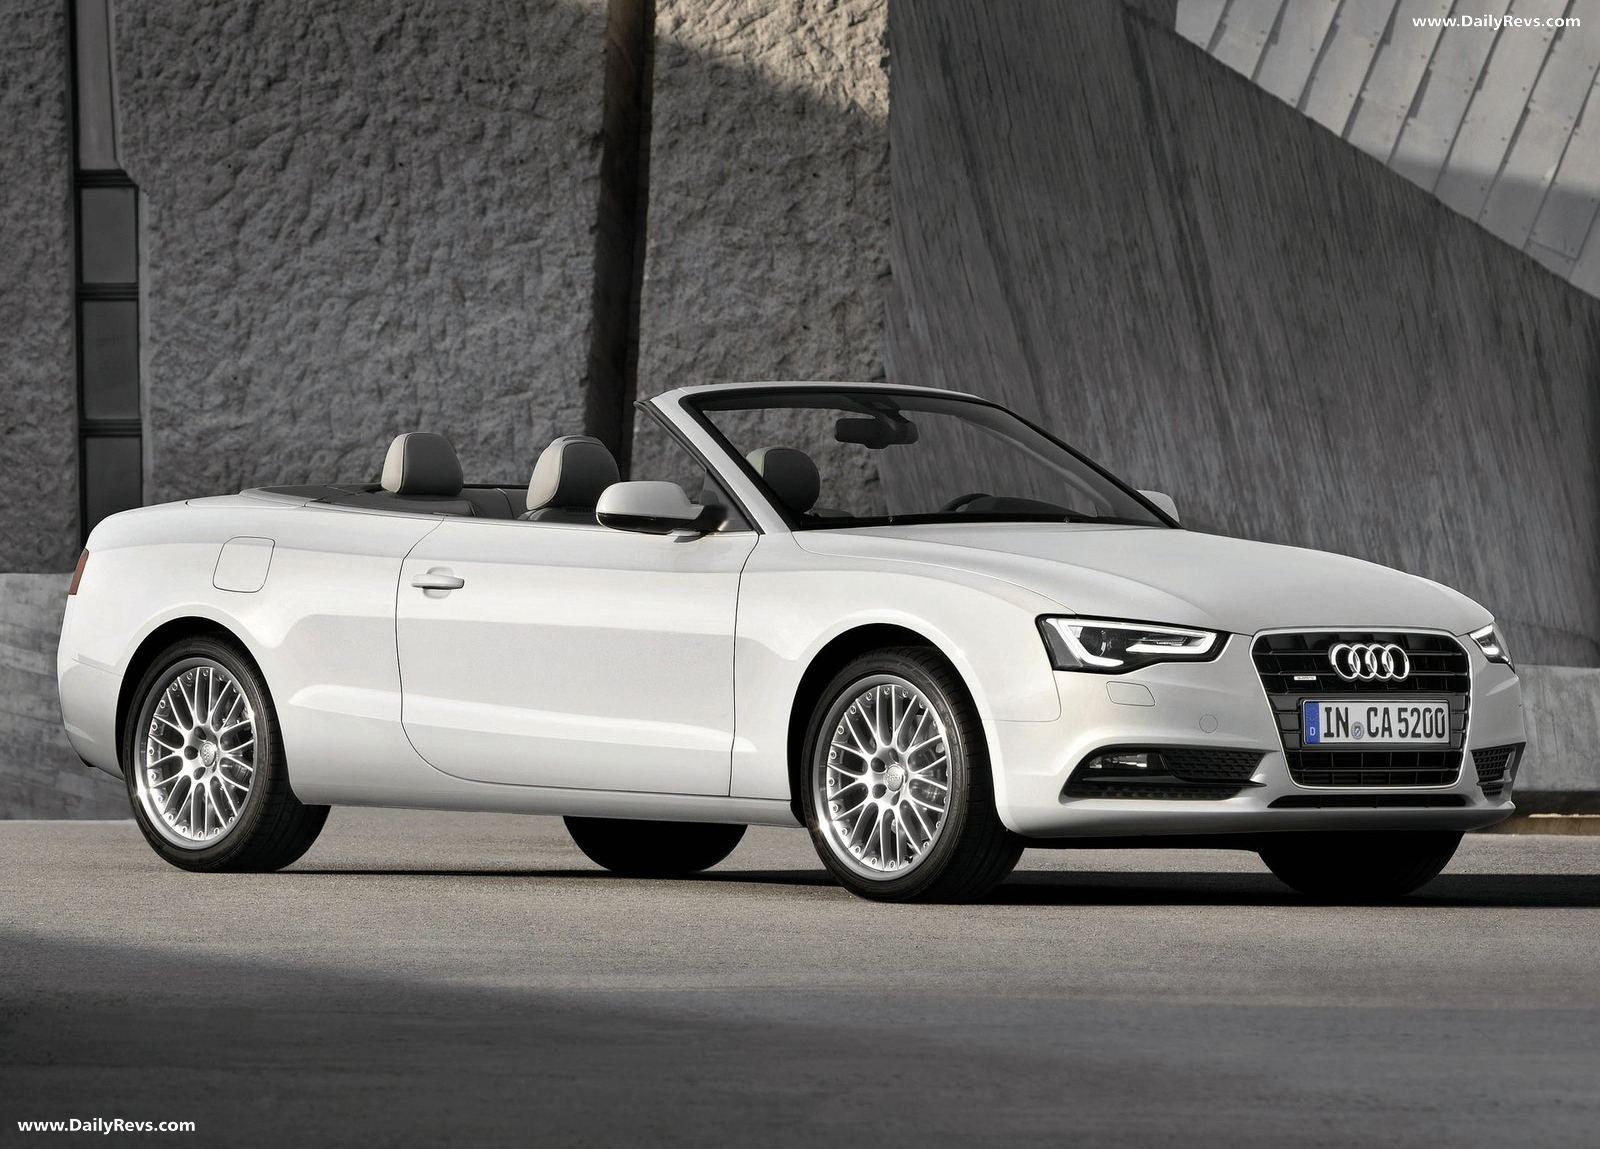 2012 Audi A5 Cabriolet - HD Pictures, Videos, Specs ...